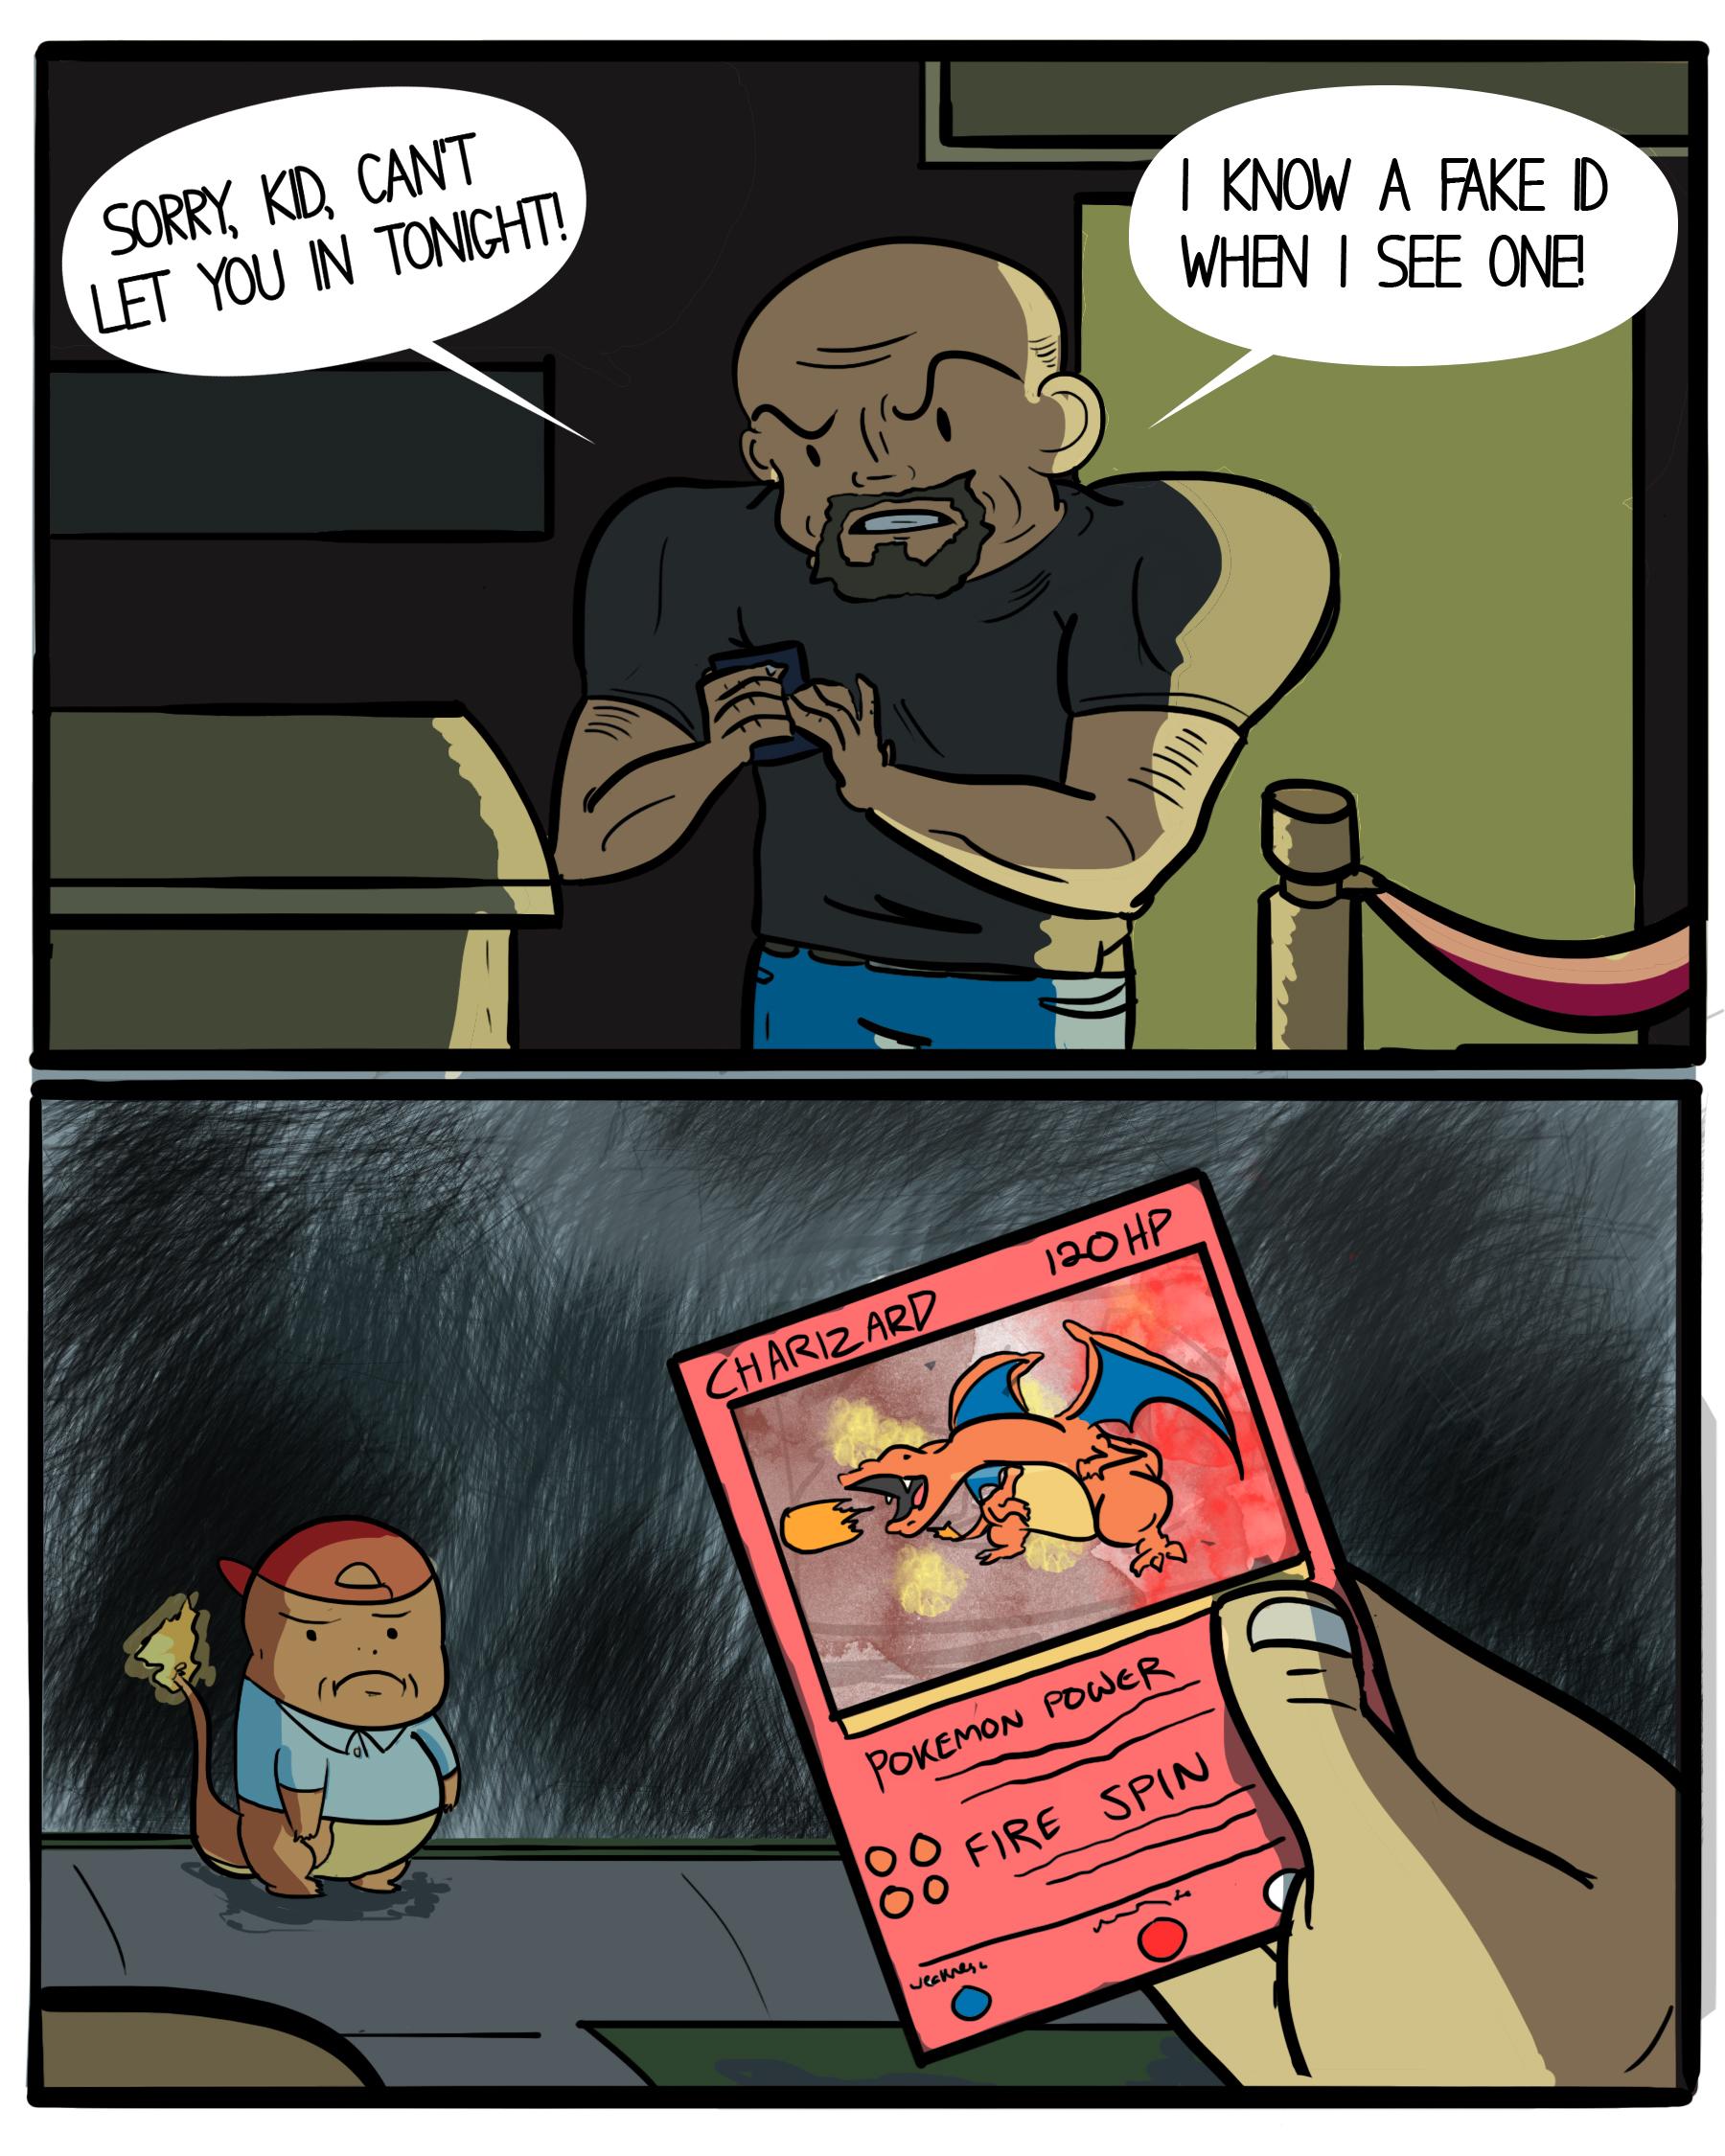 Pokémon Id Know Fake Meme Your